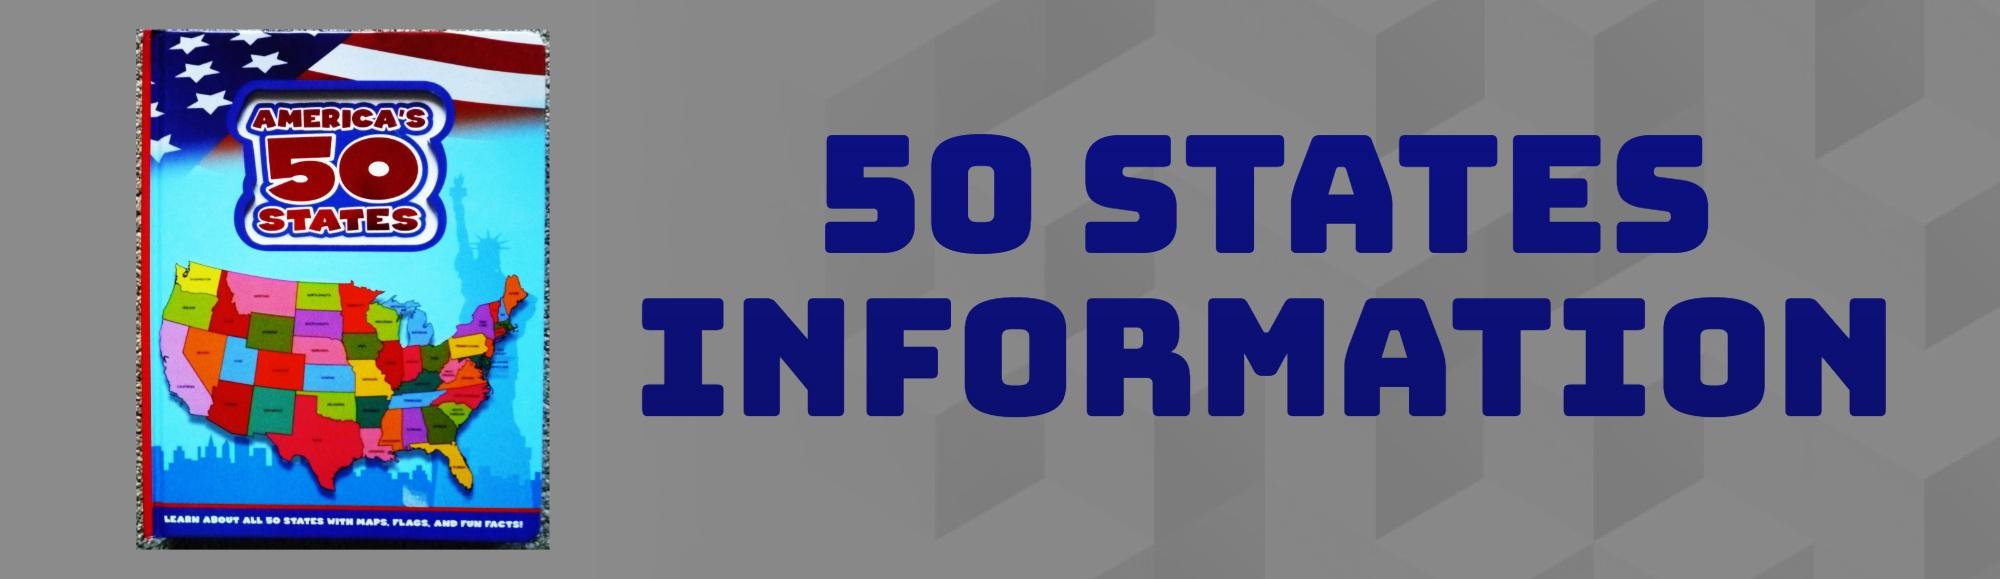 50 STATES INFORMATION